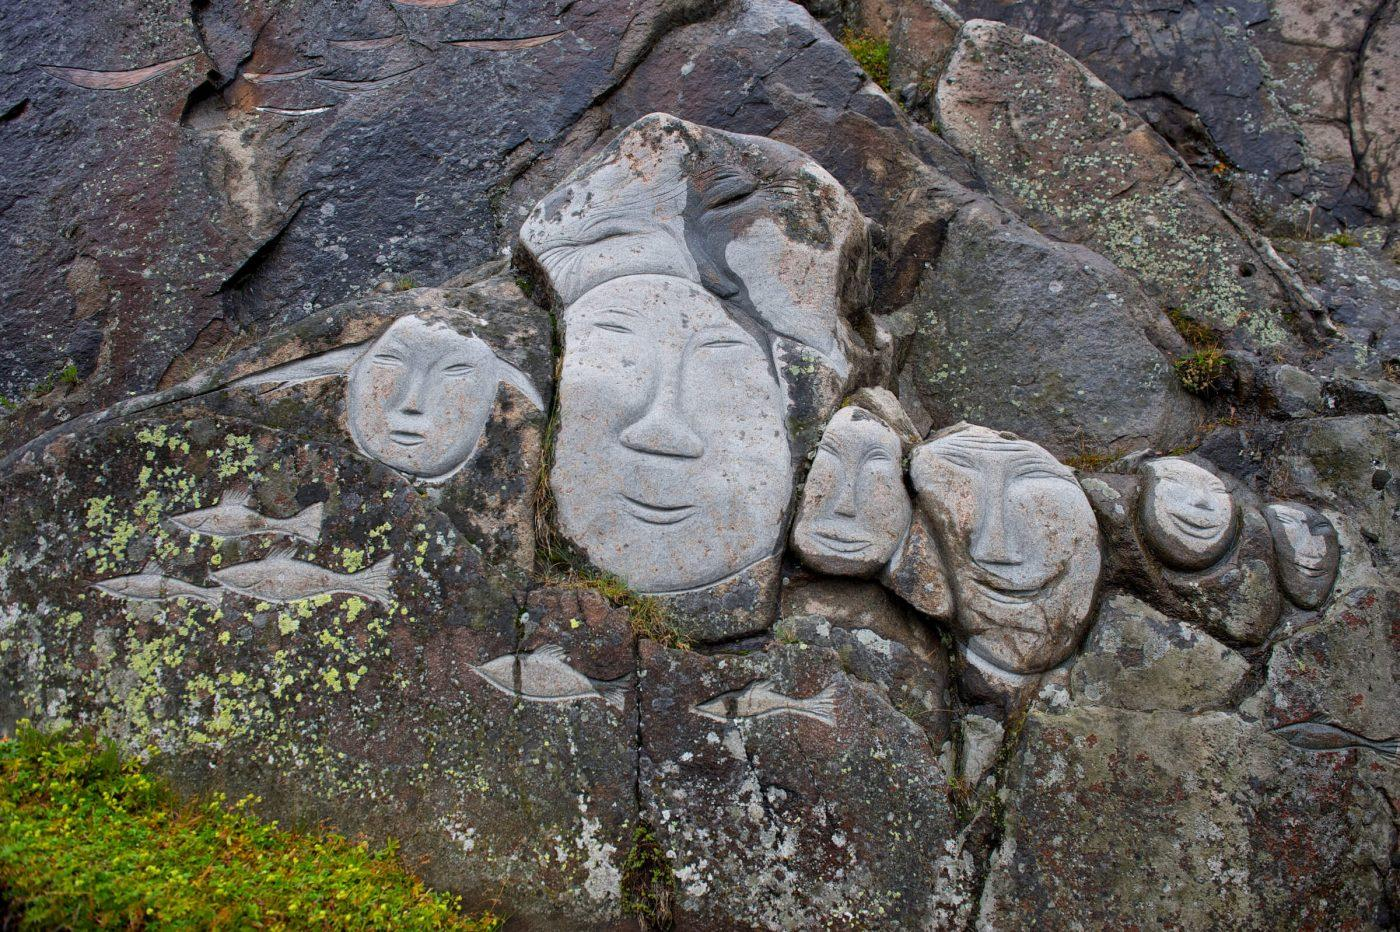 Stone & Man sculptures in Qaqortoq in South Greenland. Photo by David Buchmann - Visit Greenland